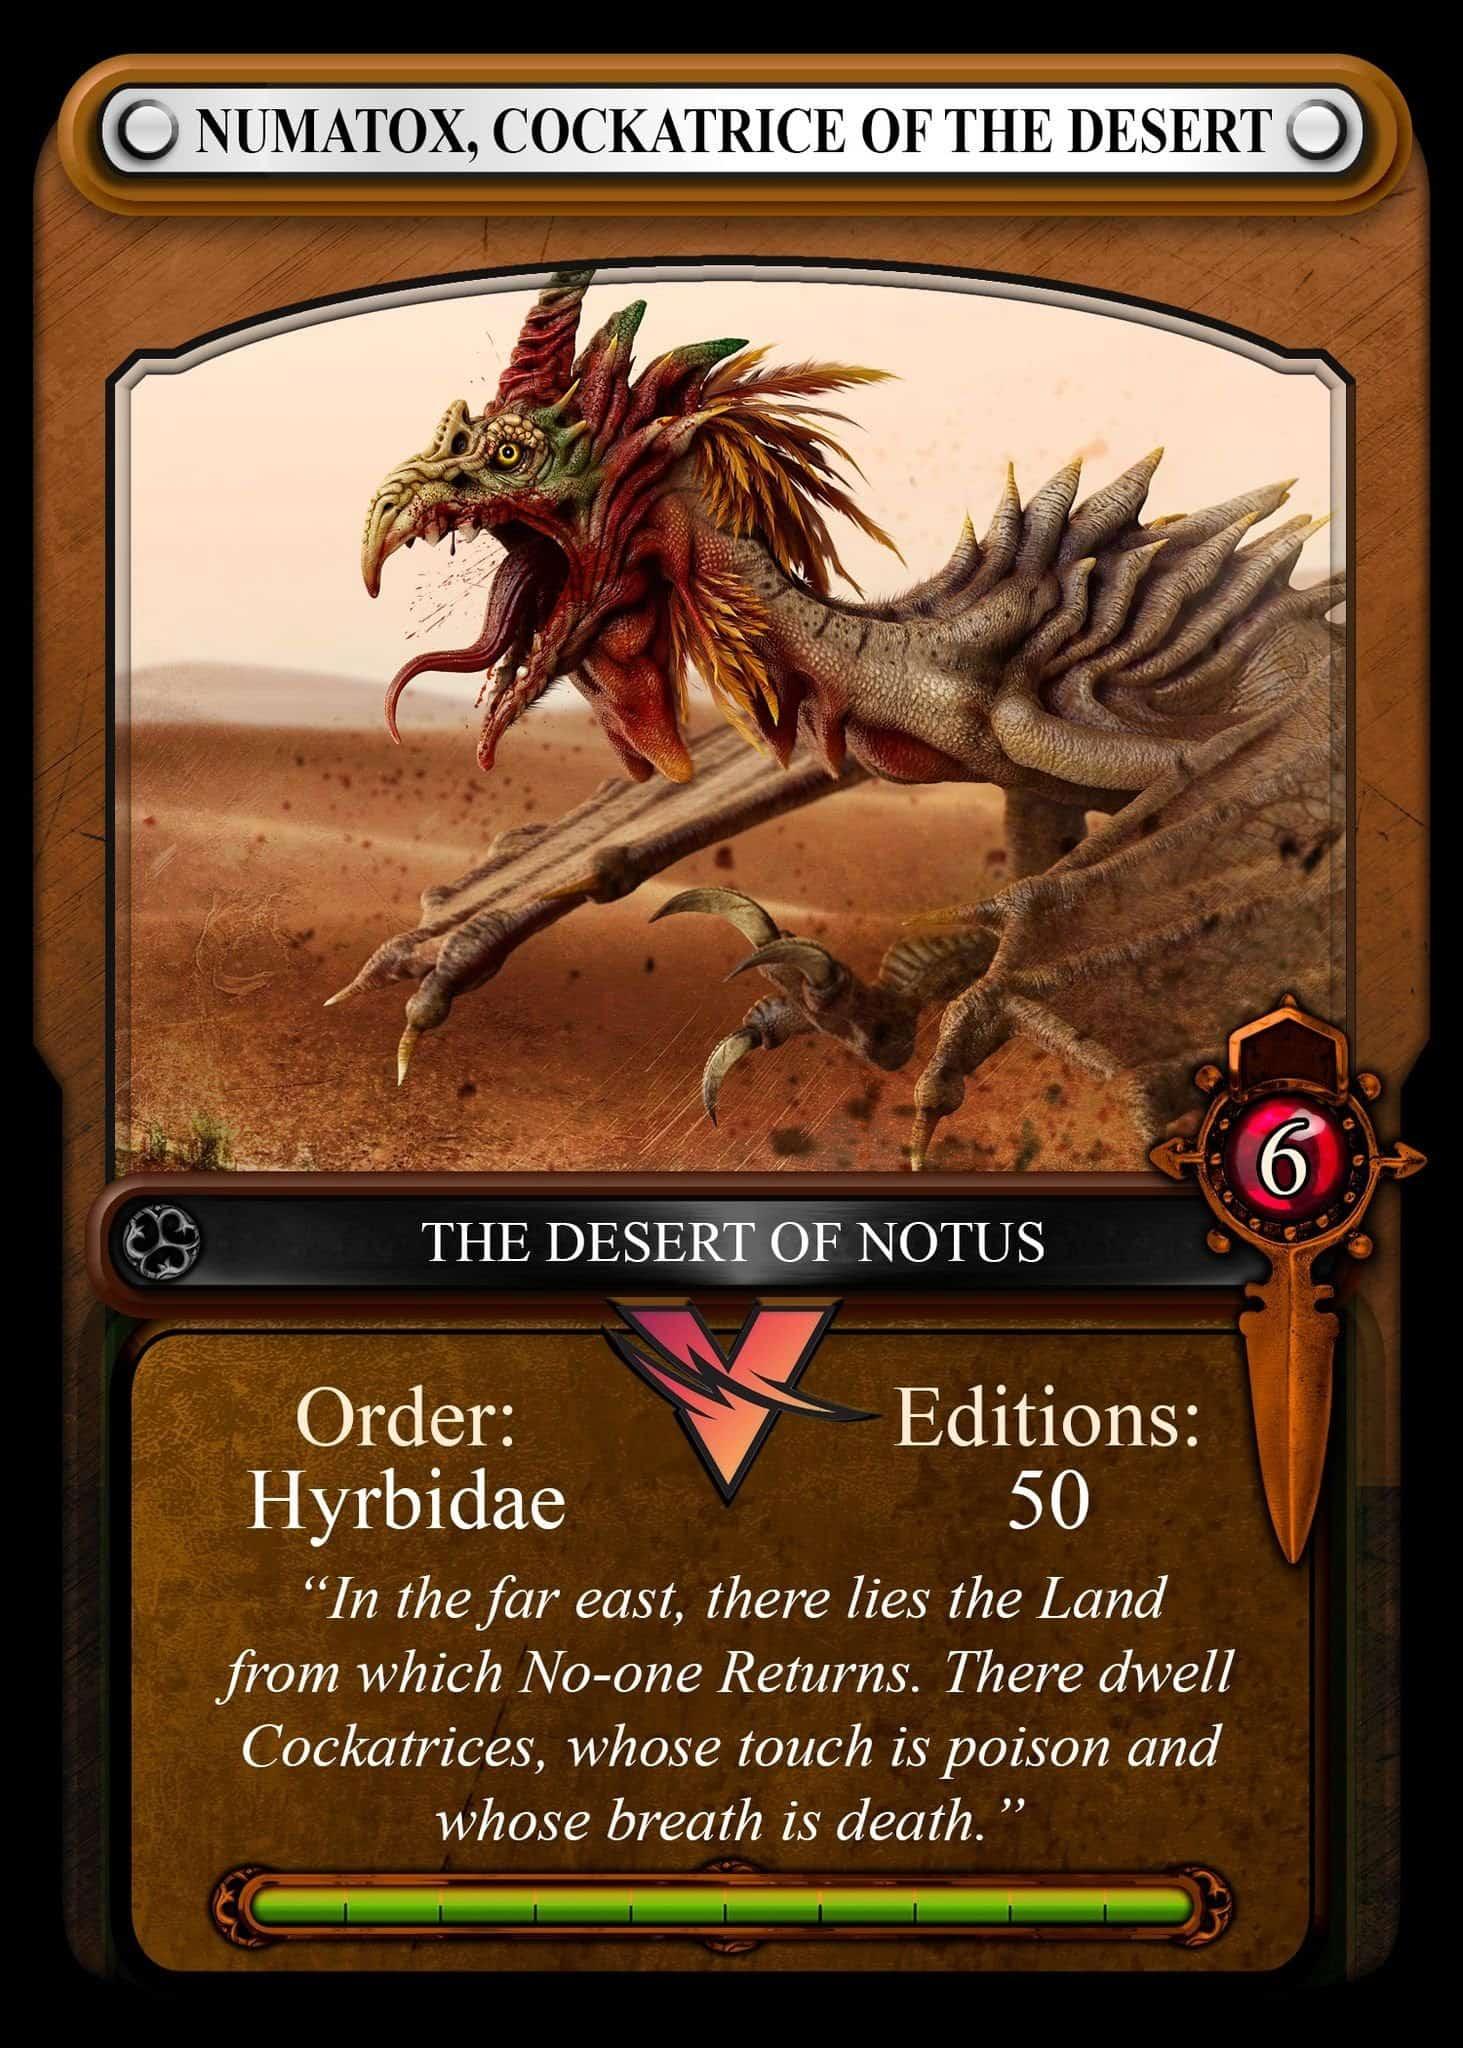 Desert of Notus Card Vulcan Forged